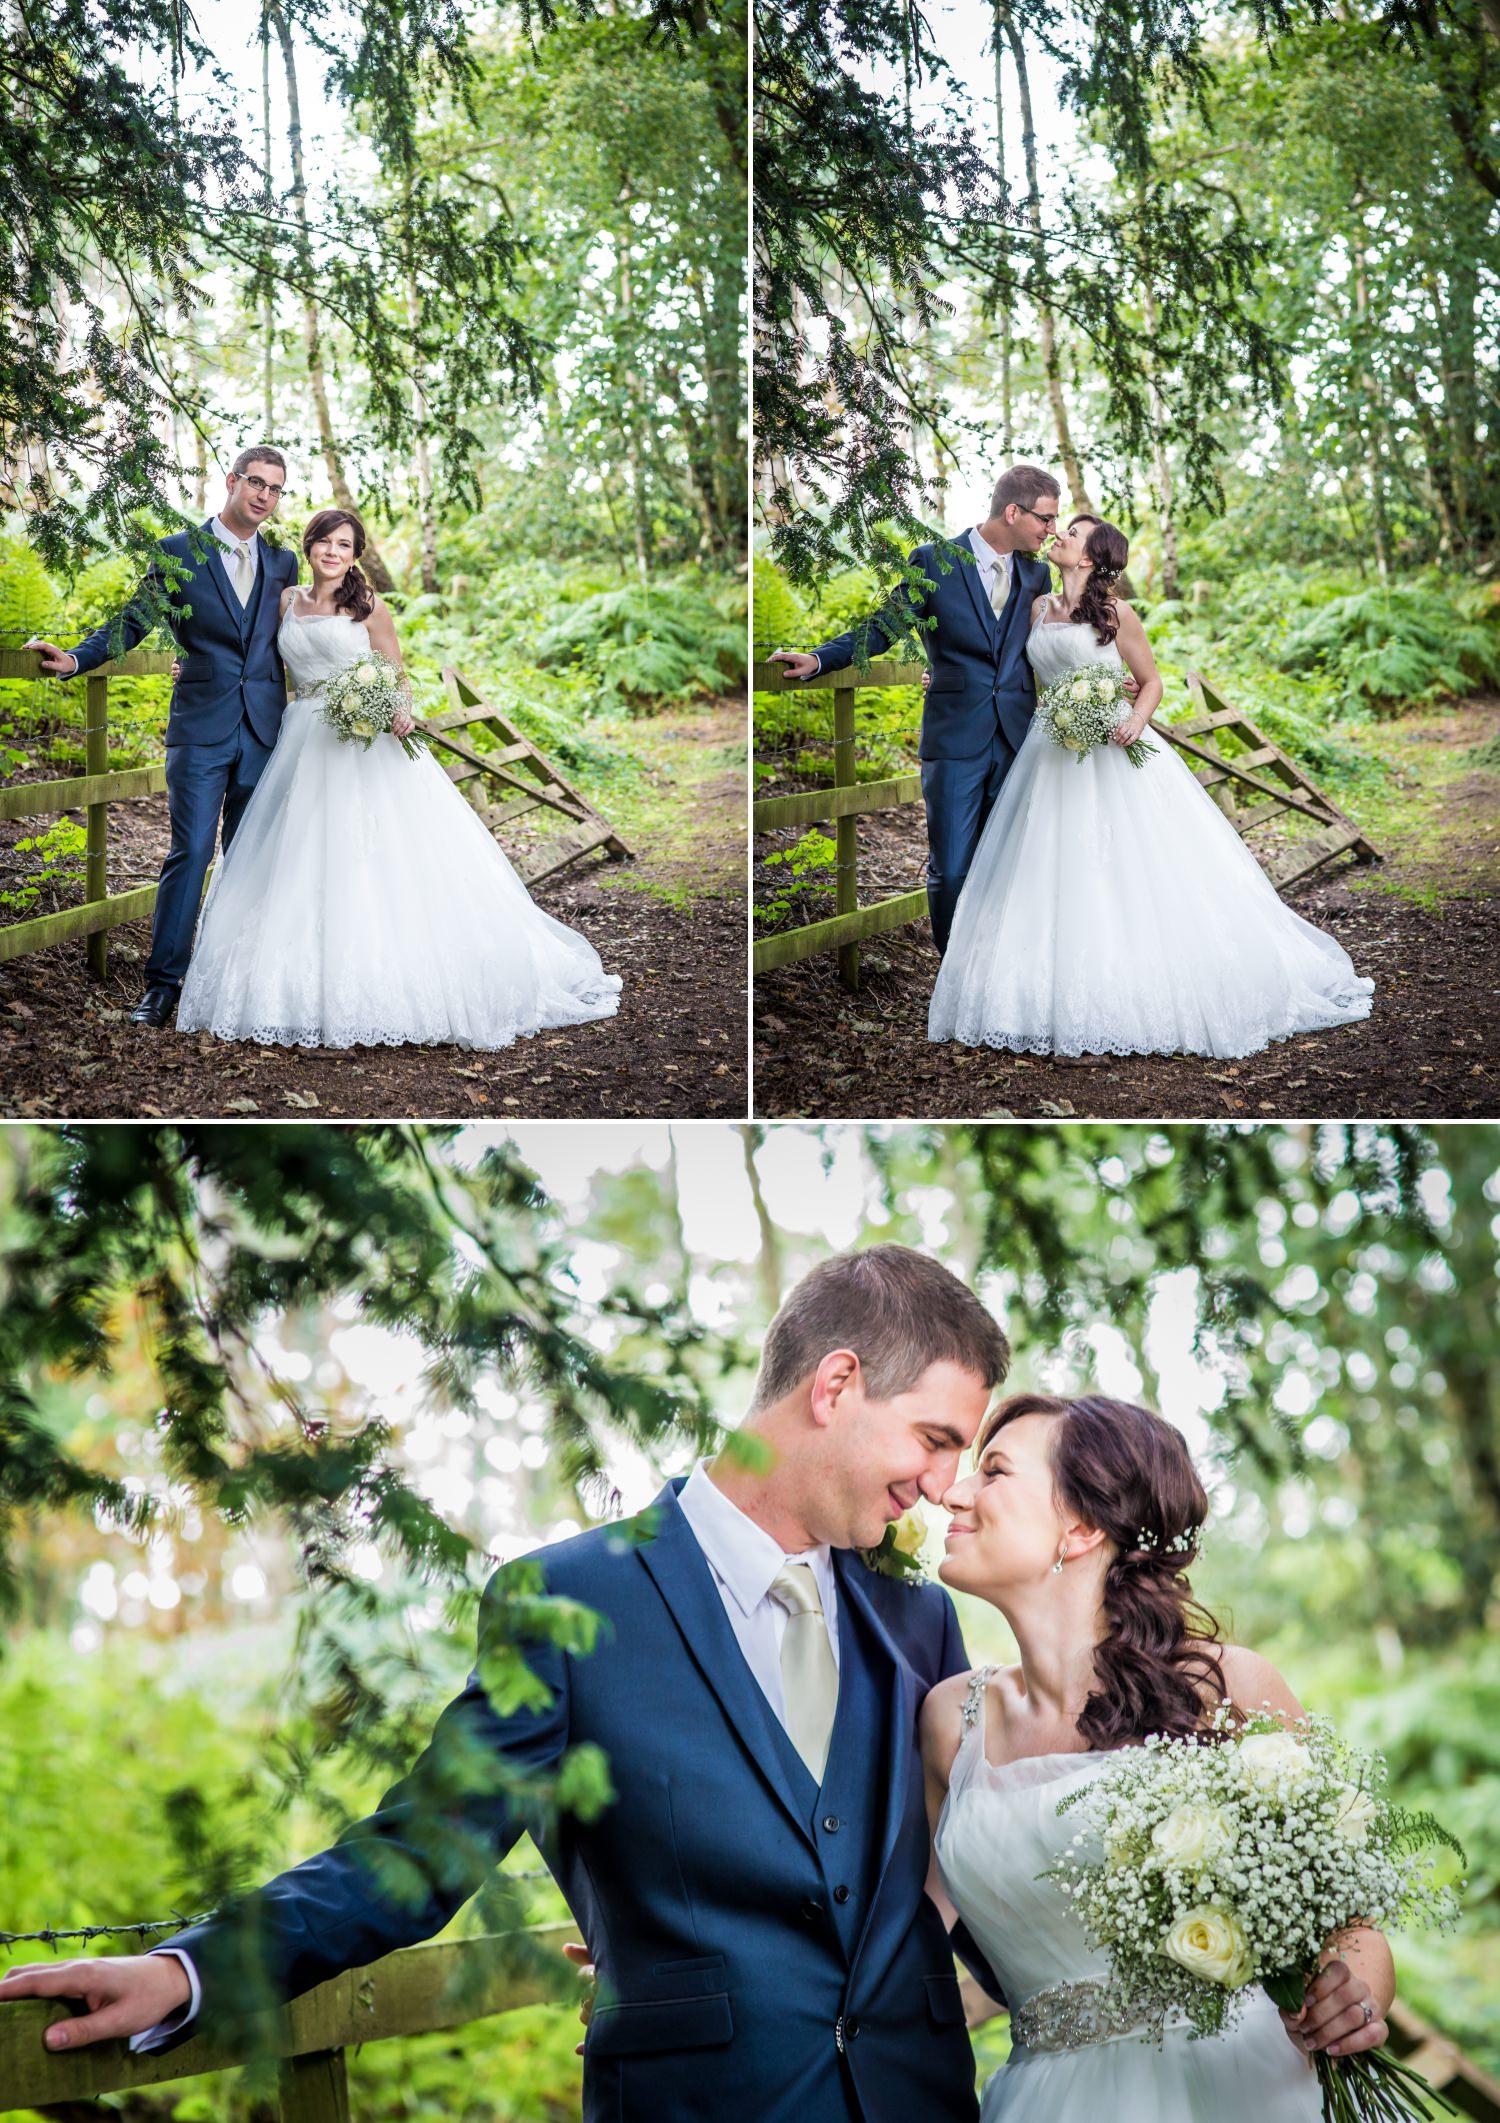 Couple wedding photographs at Peckforton Castle, Chester